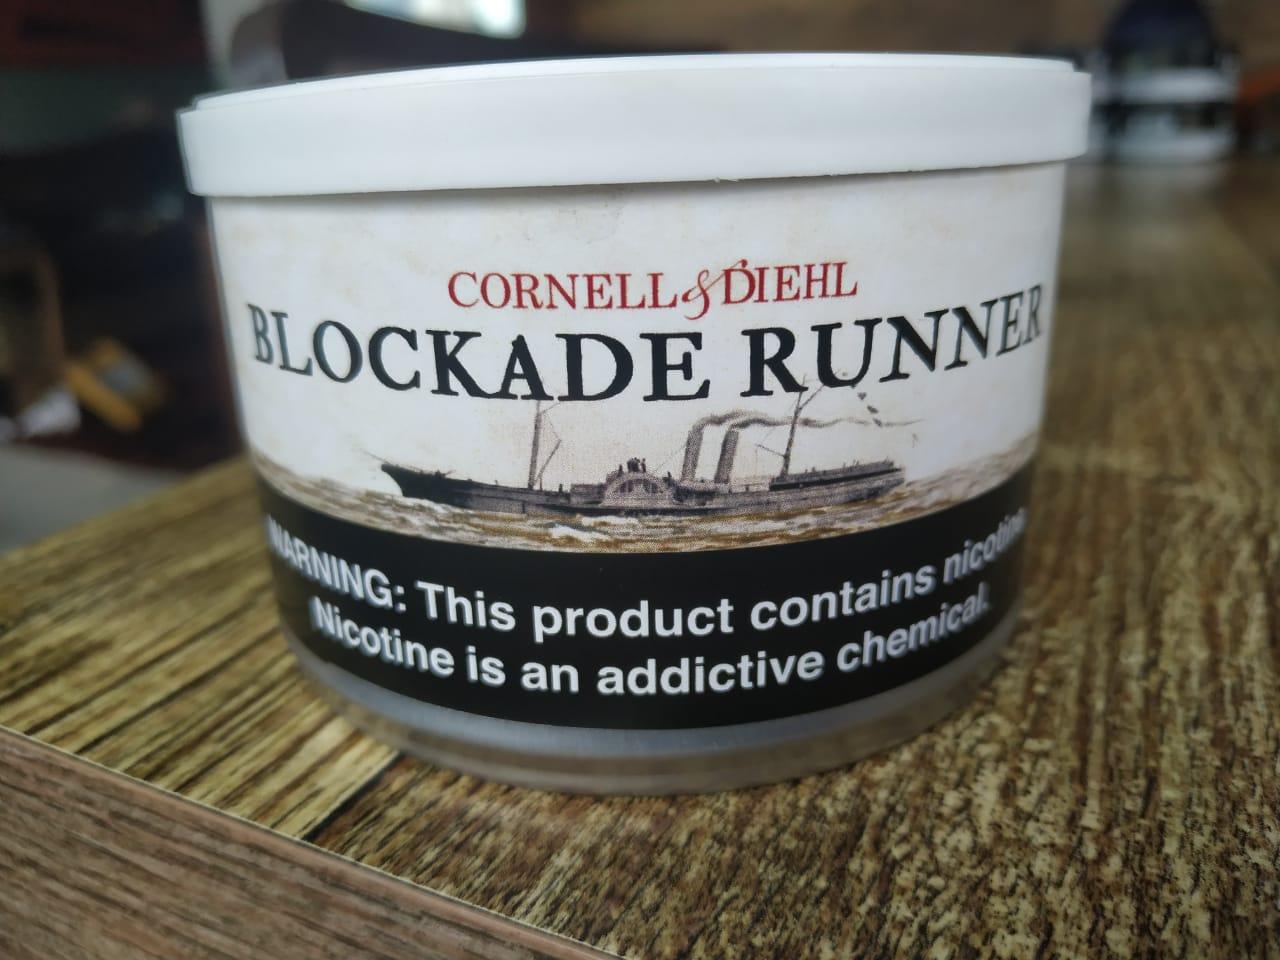 Cornell & Diehl - Blockade Runner